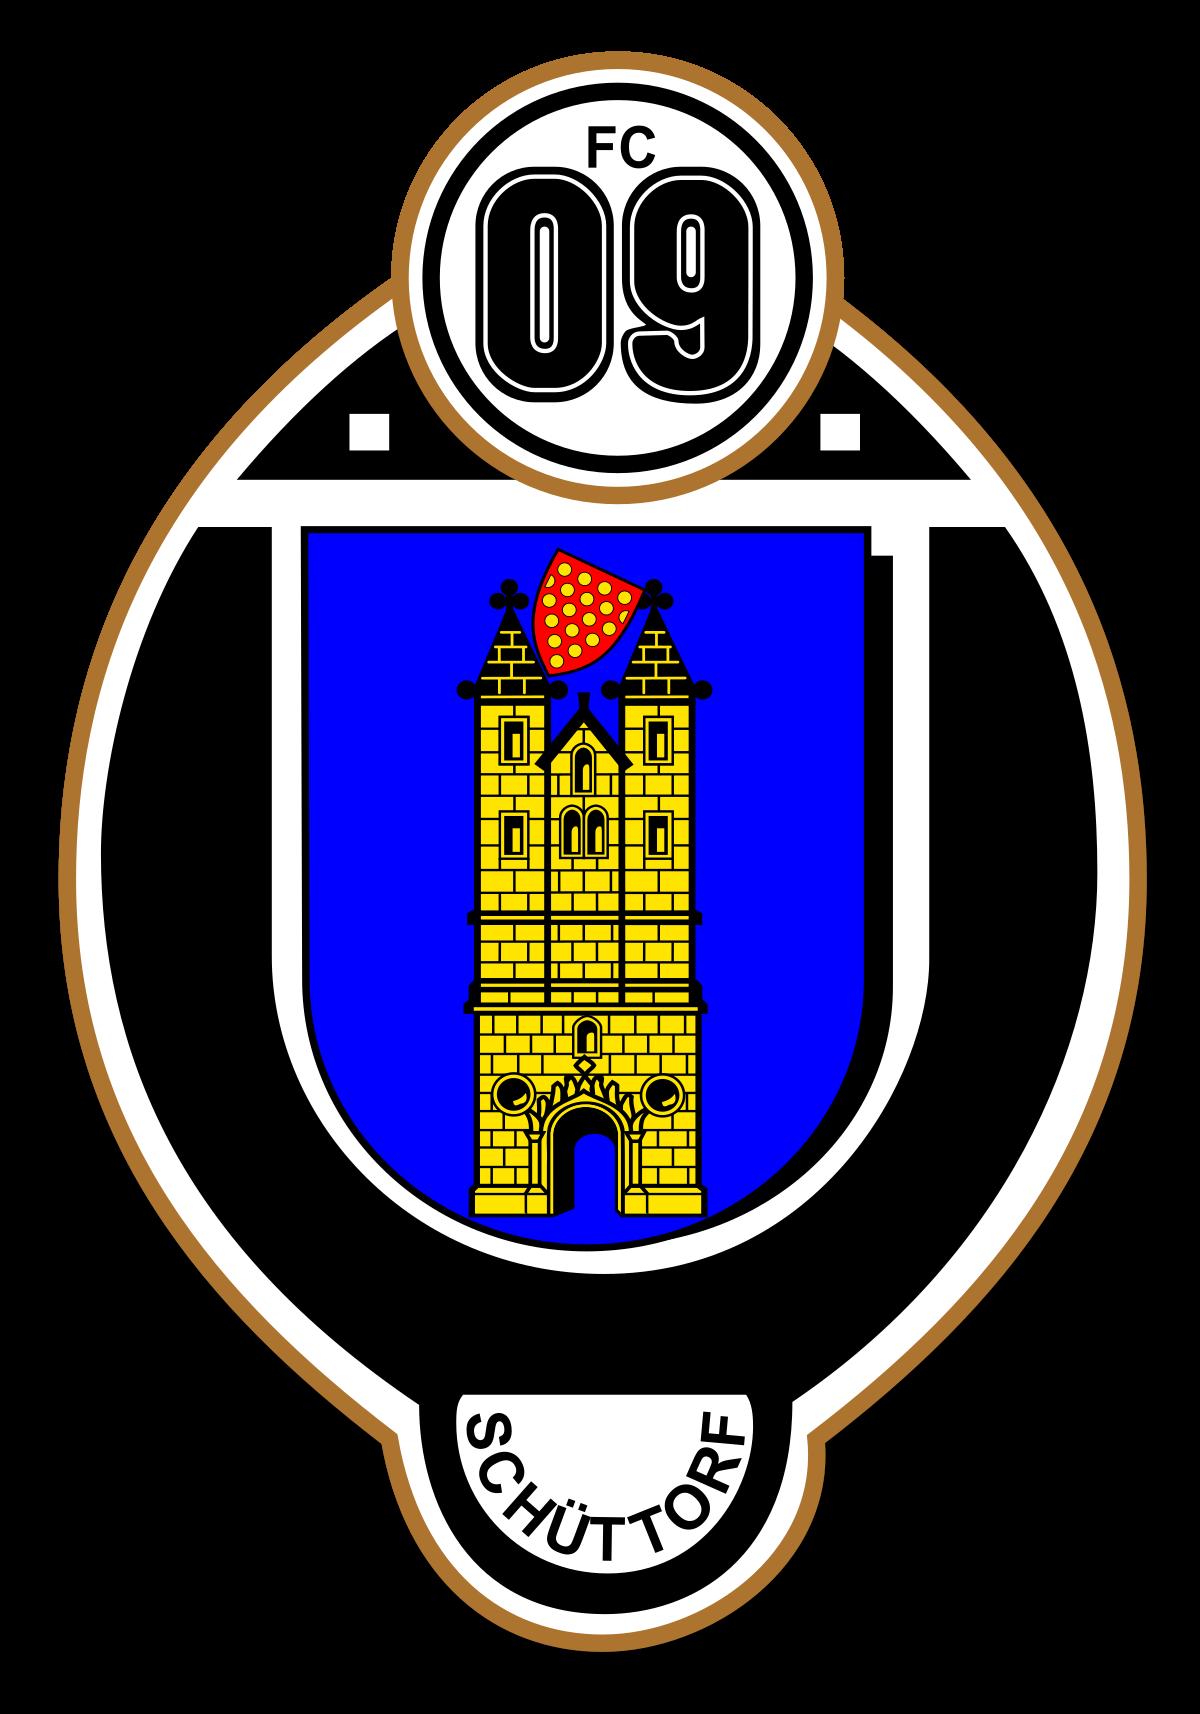 FC Schüttorf 1909 e.V. I